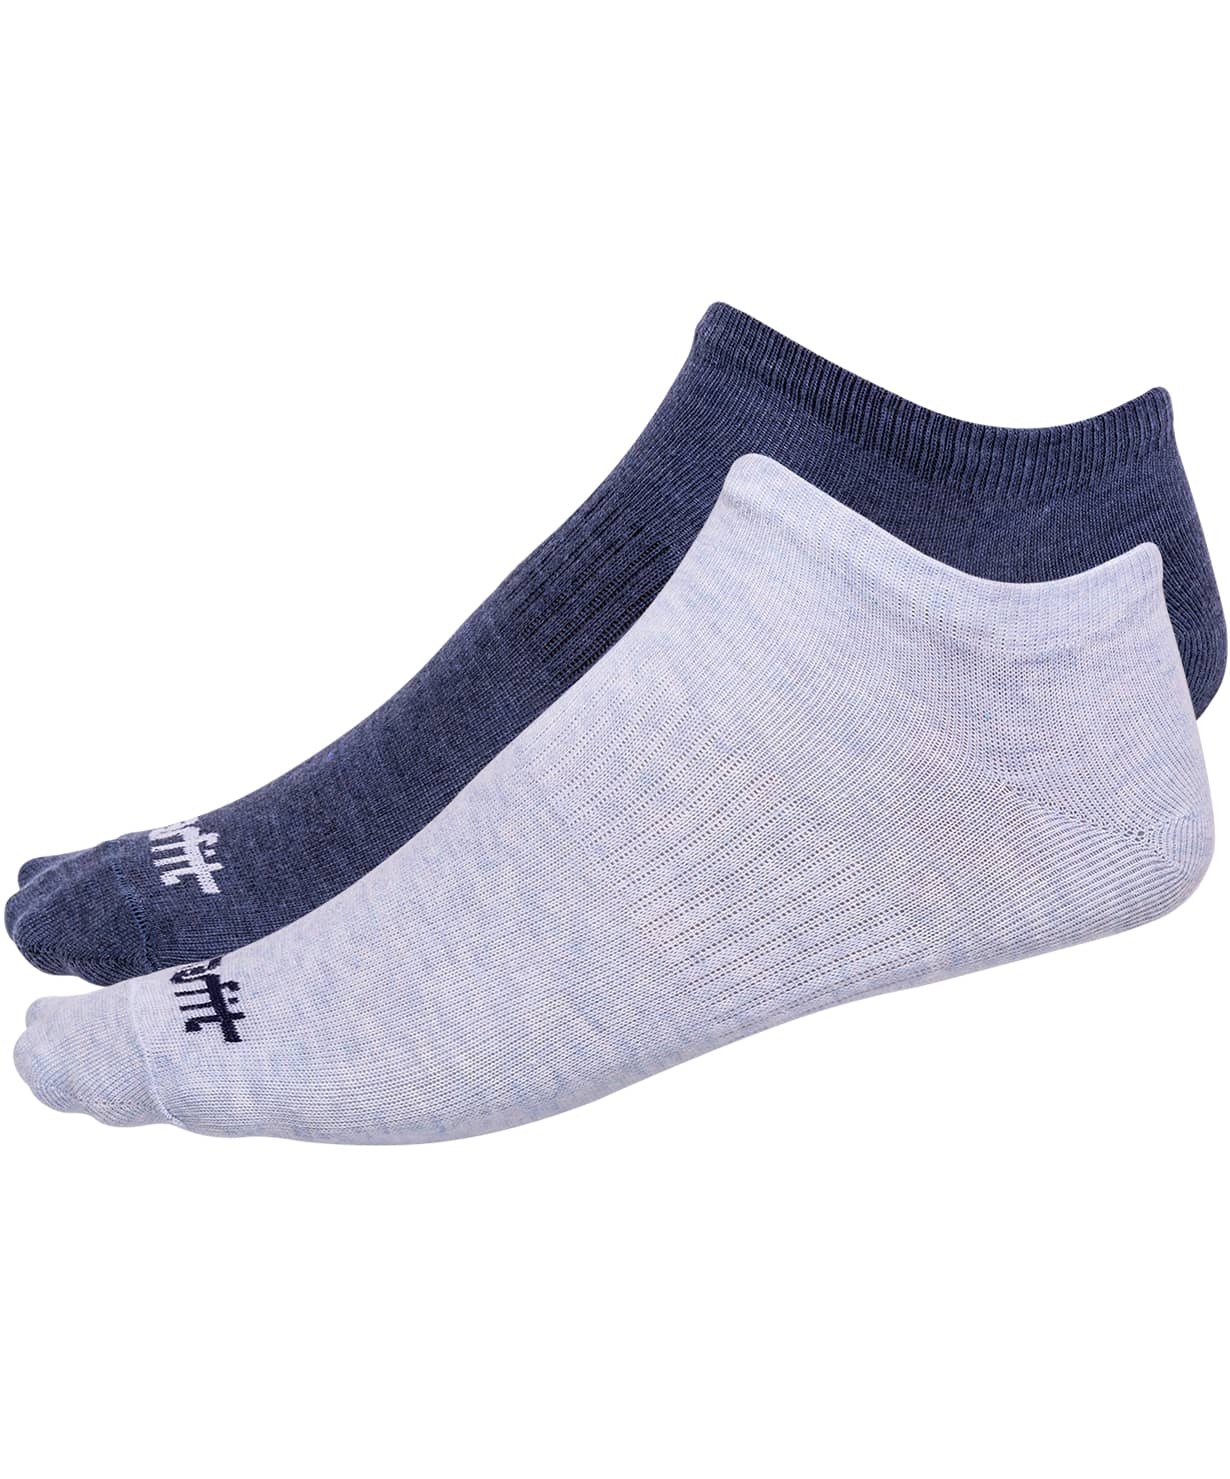 Носки низкие SW-205, голубой меланж/синий меланж, 2 пары